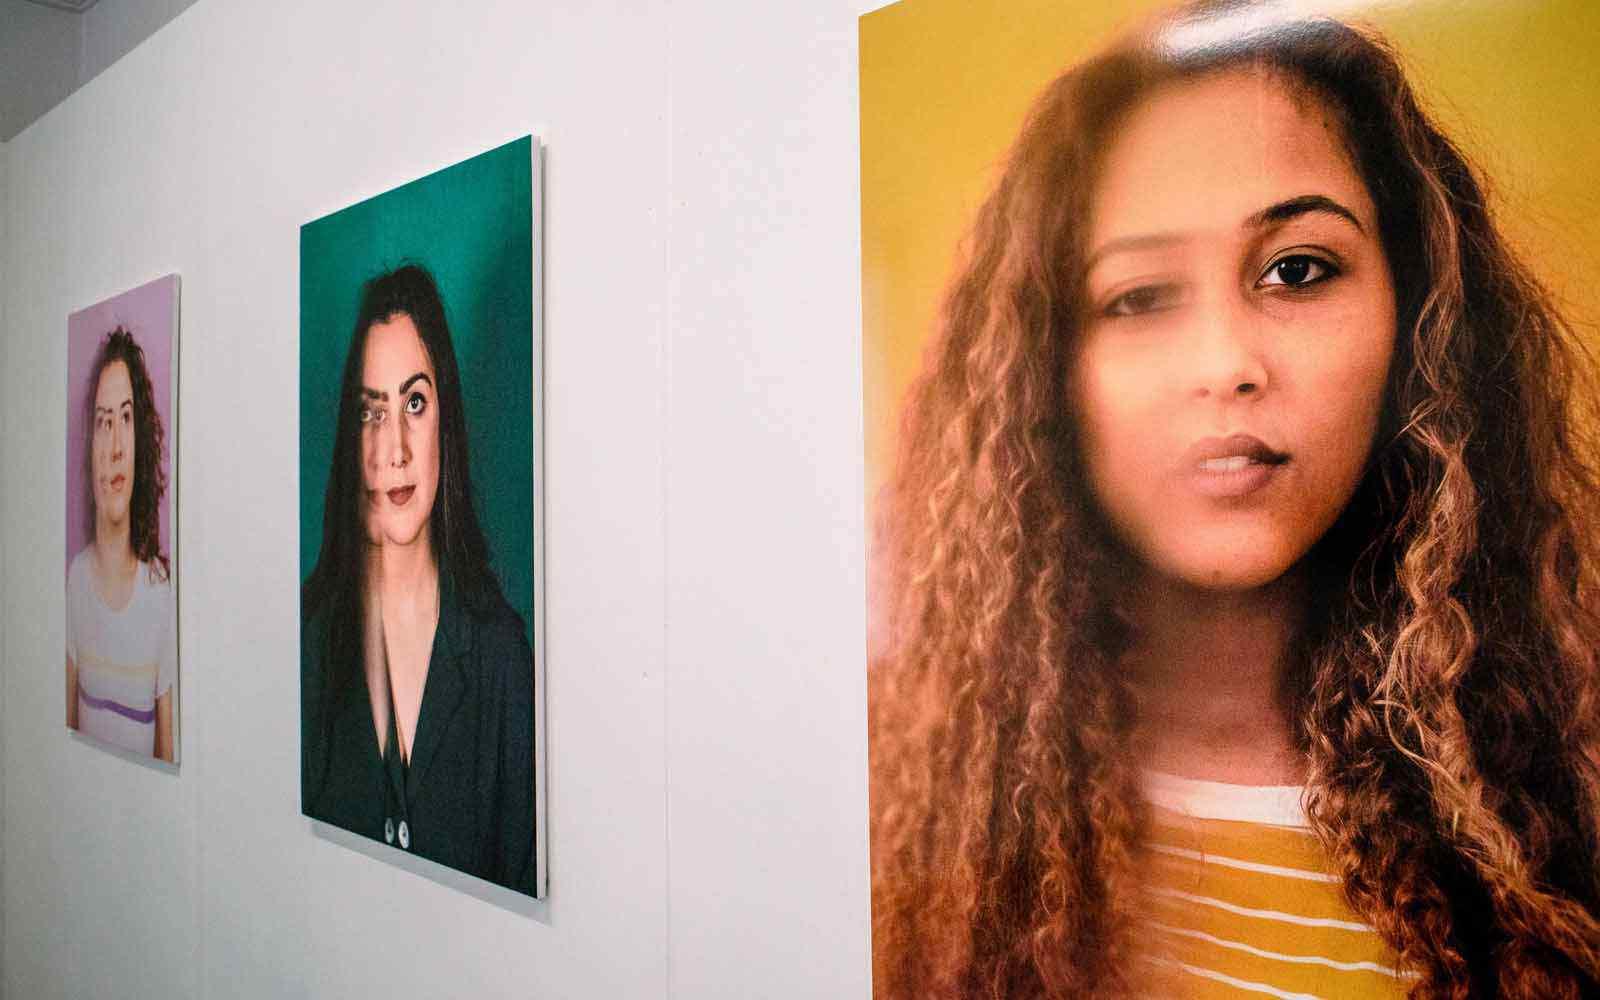 Photos in exhibition